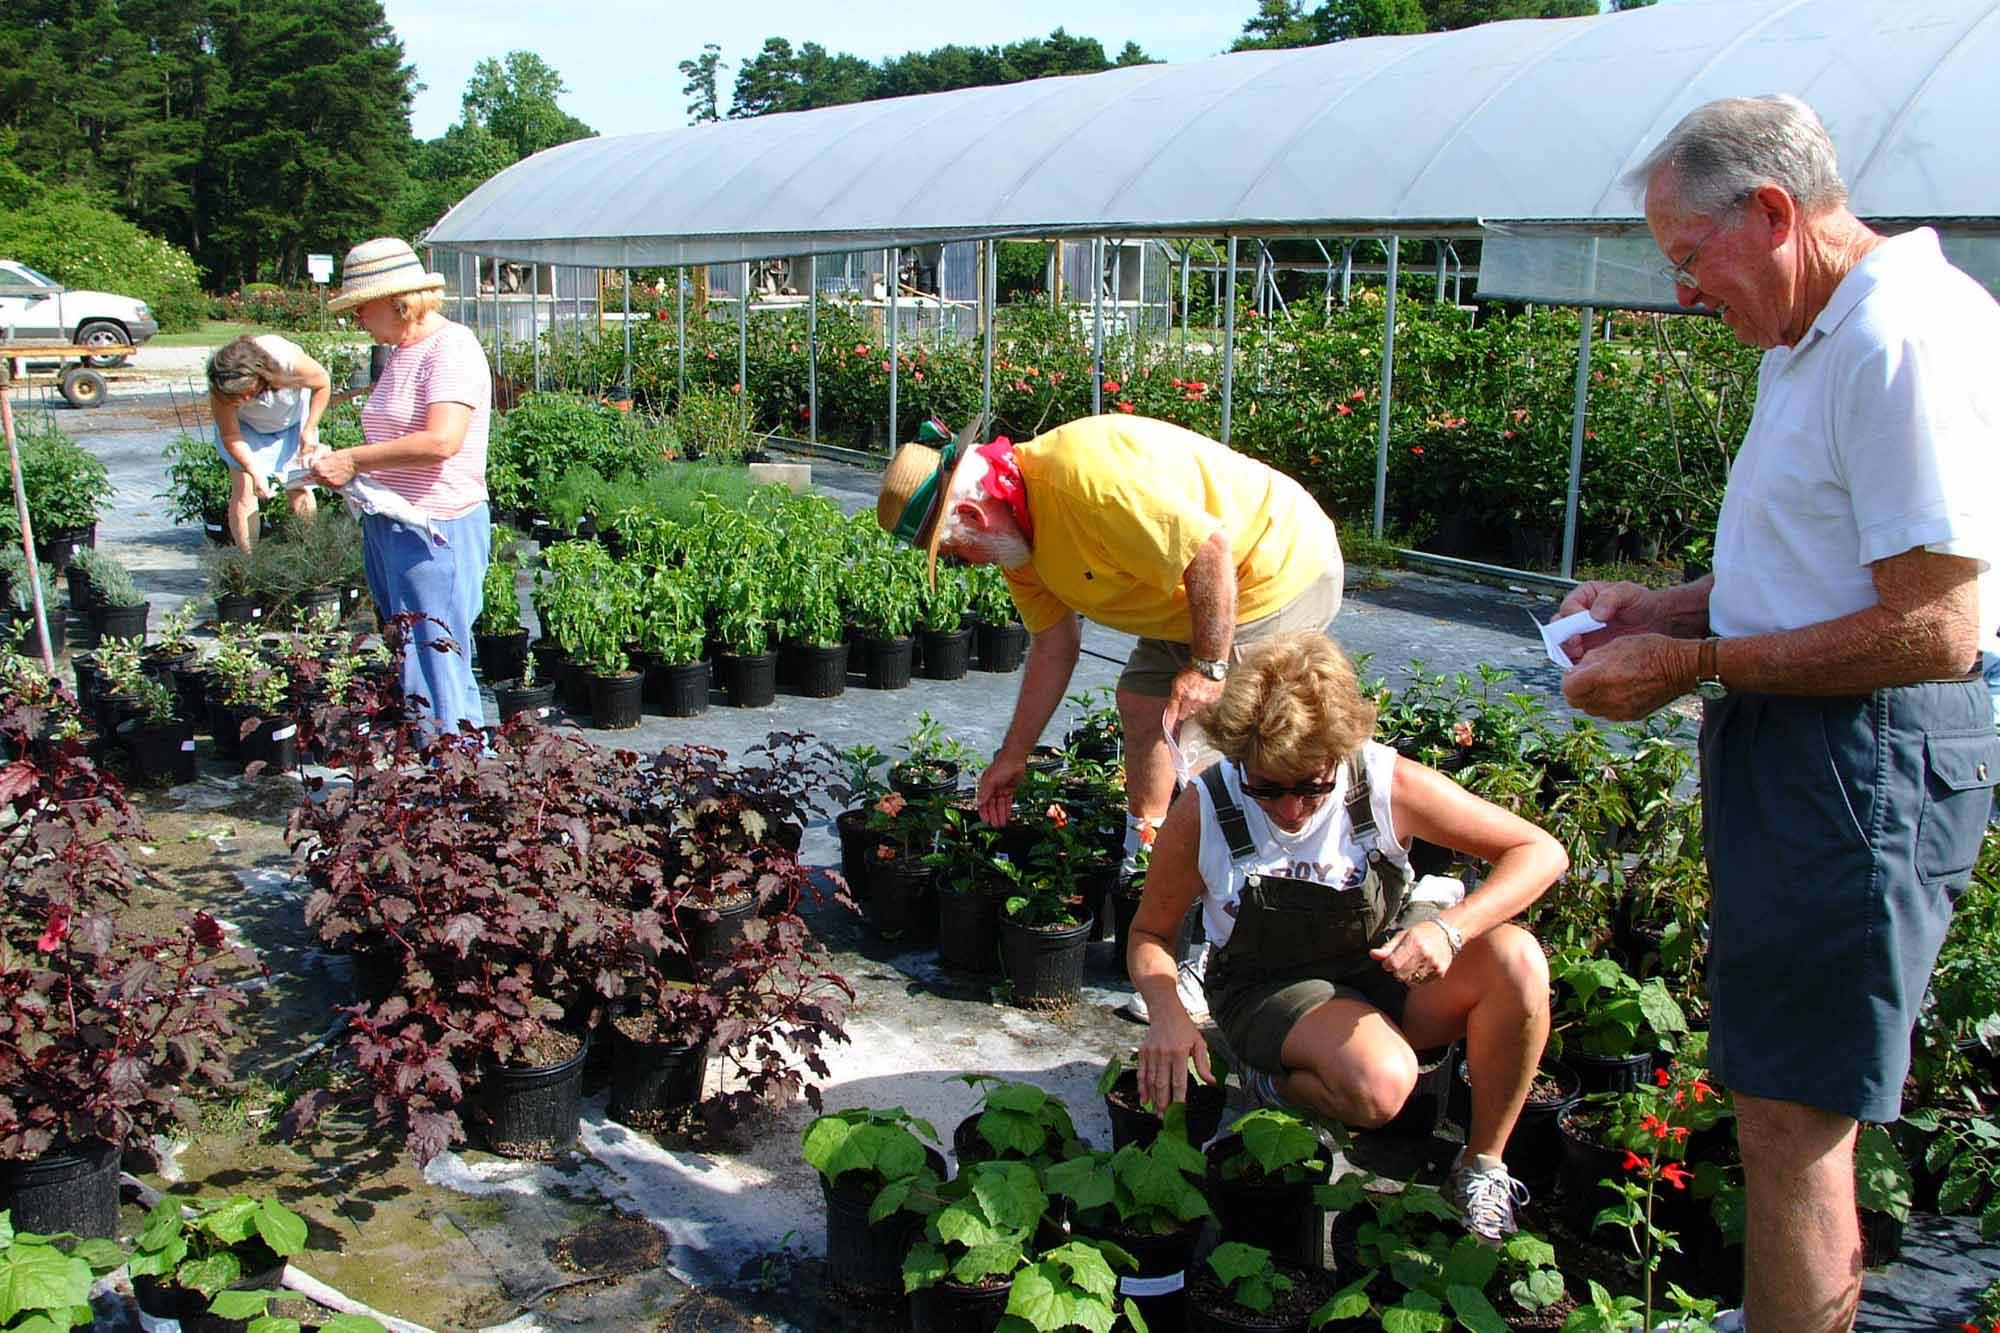 Make Friends By Growing A Garden